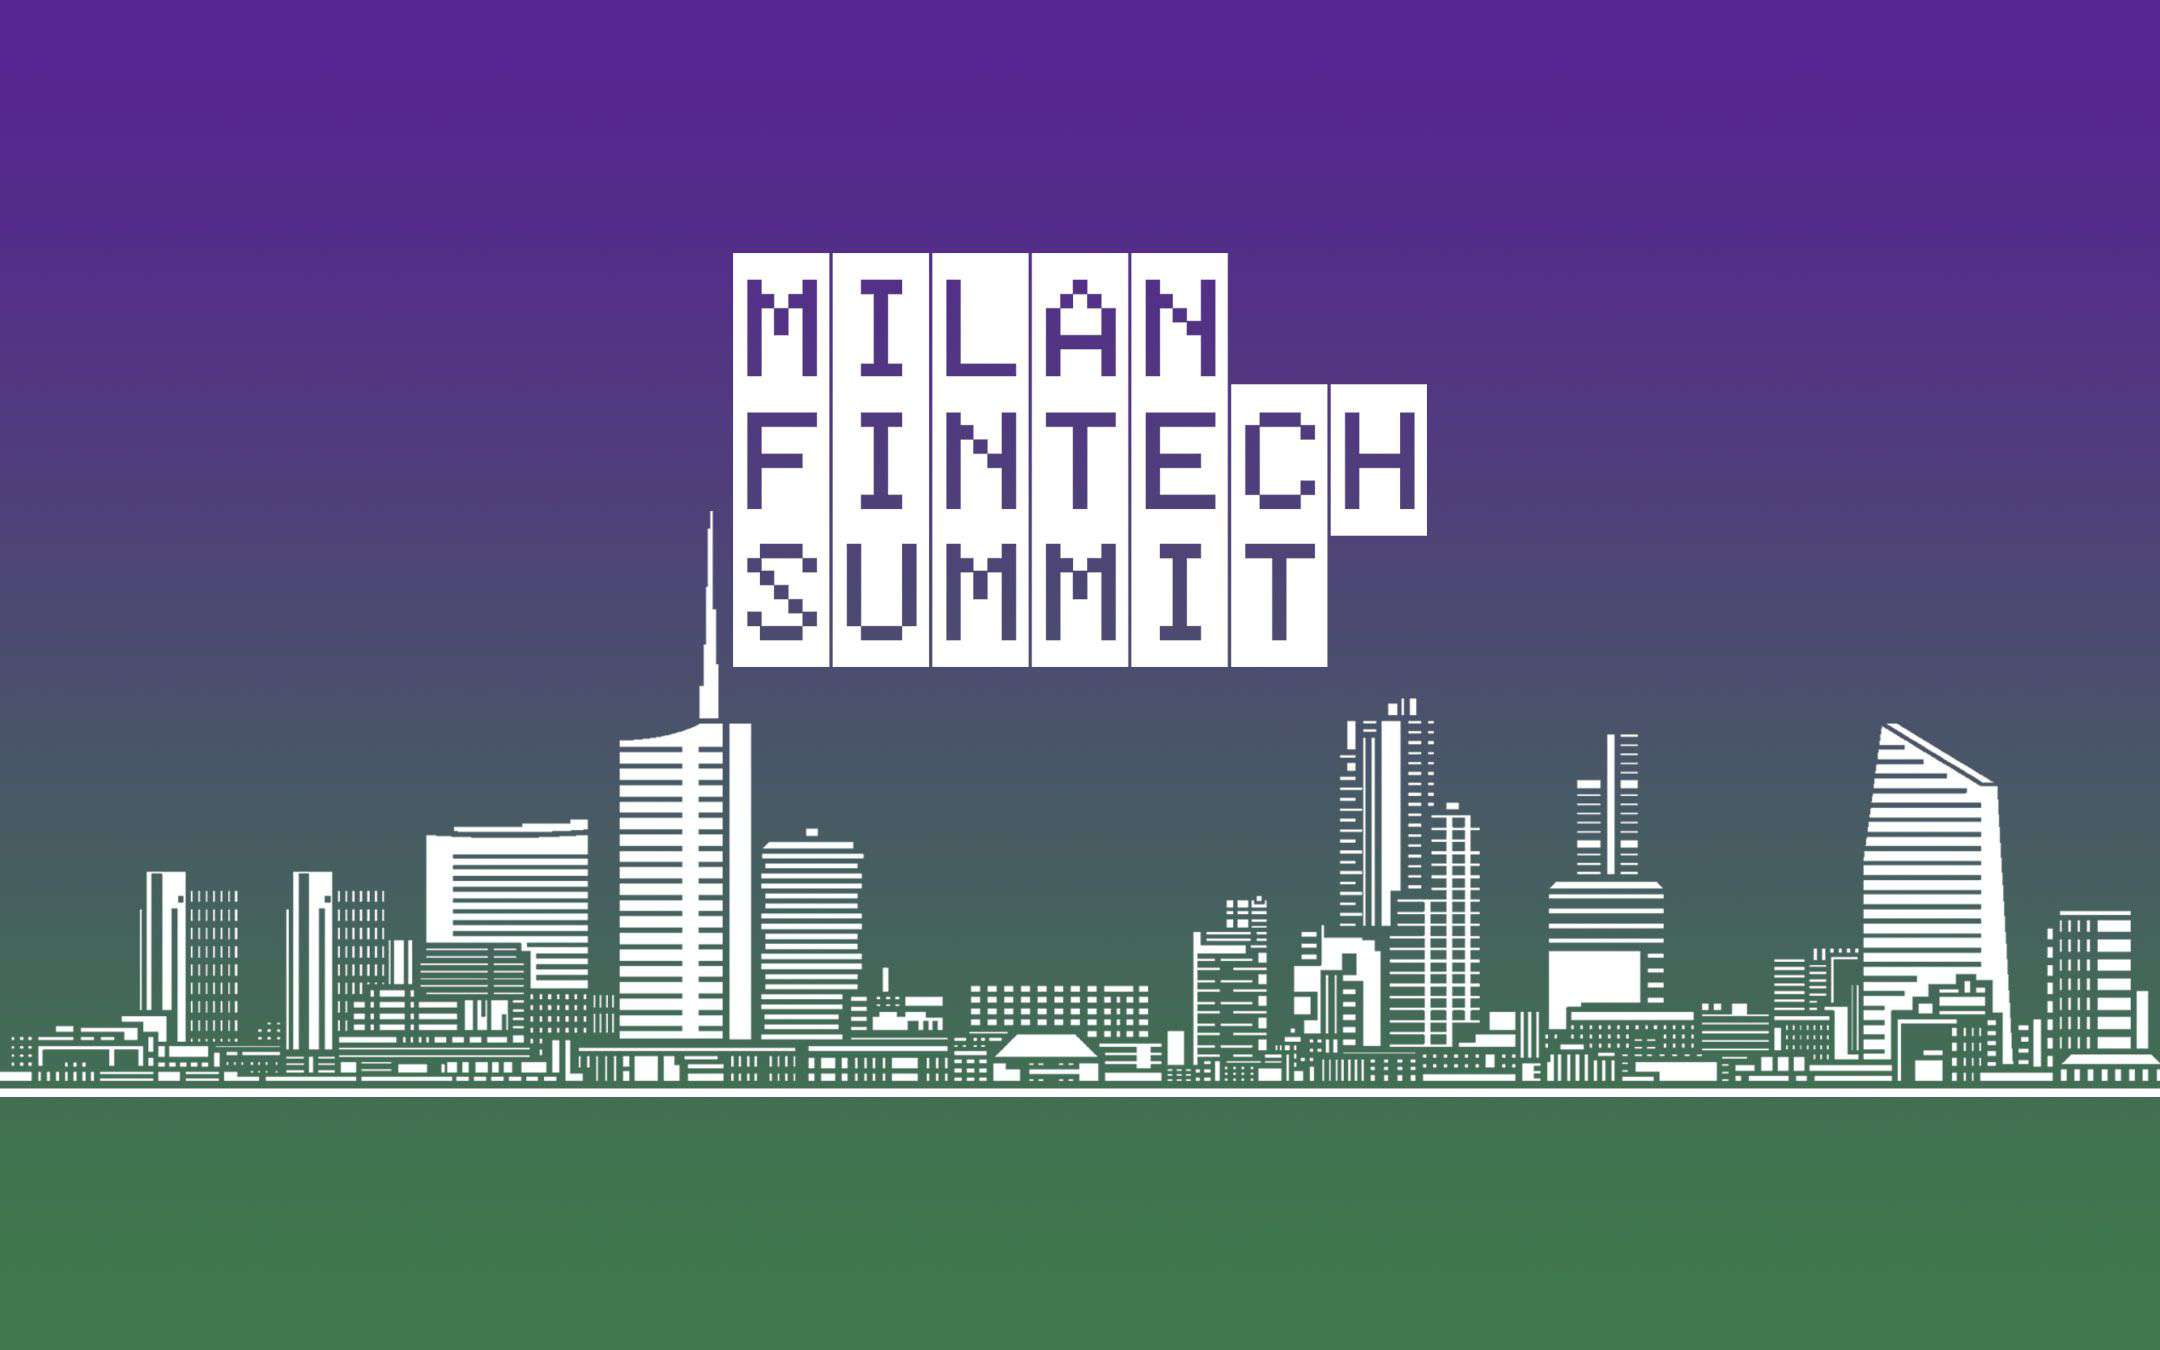 Milan Fintech Summit: 10-11 December, streaming